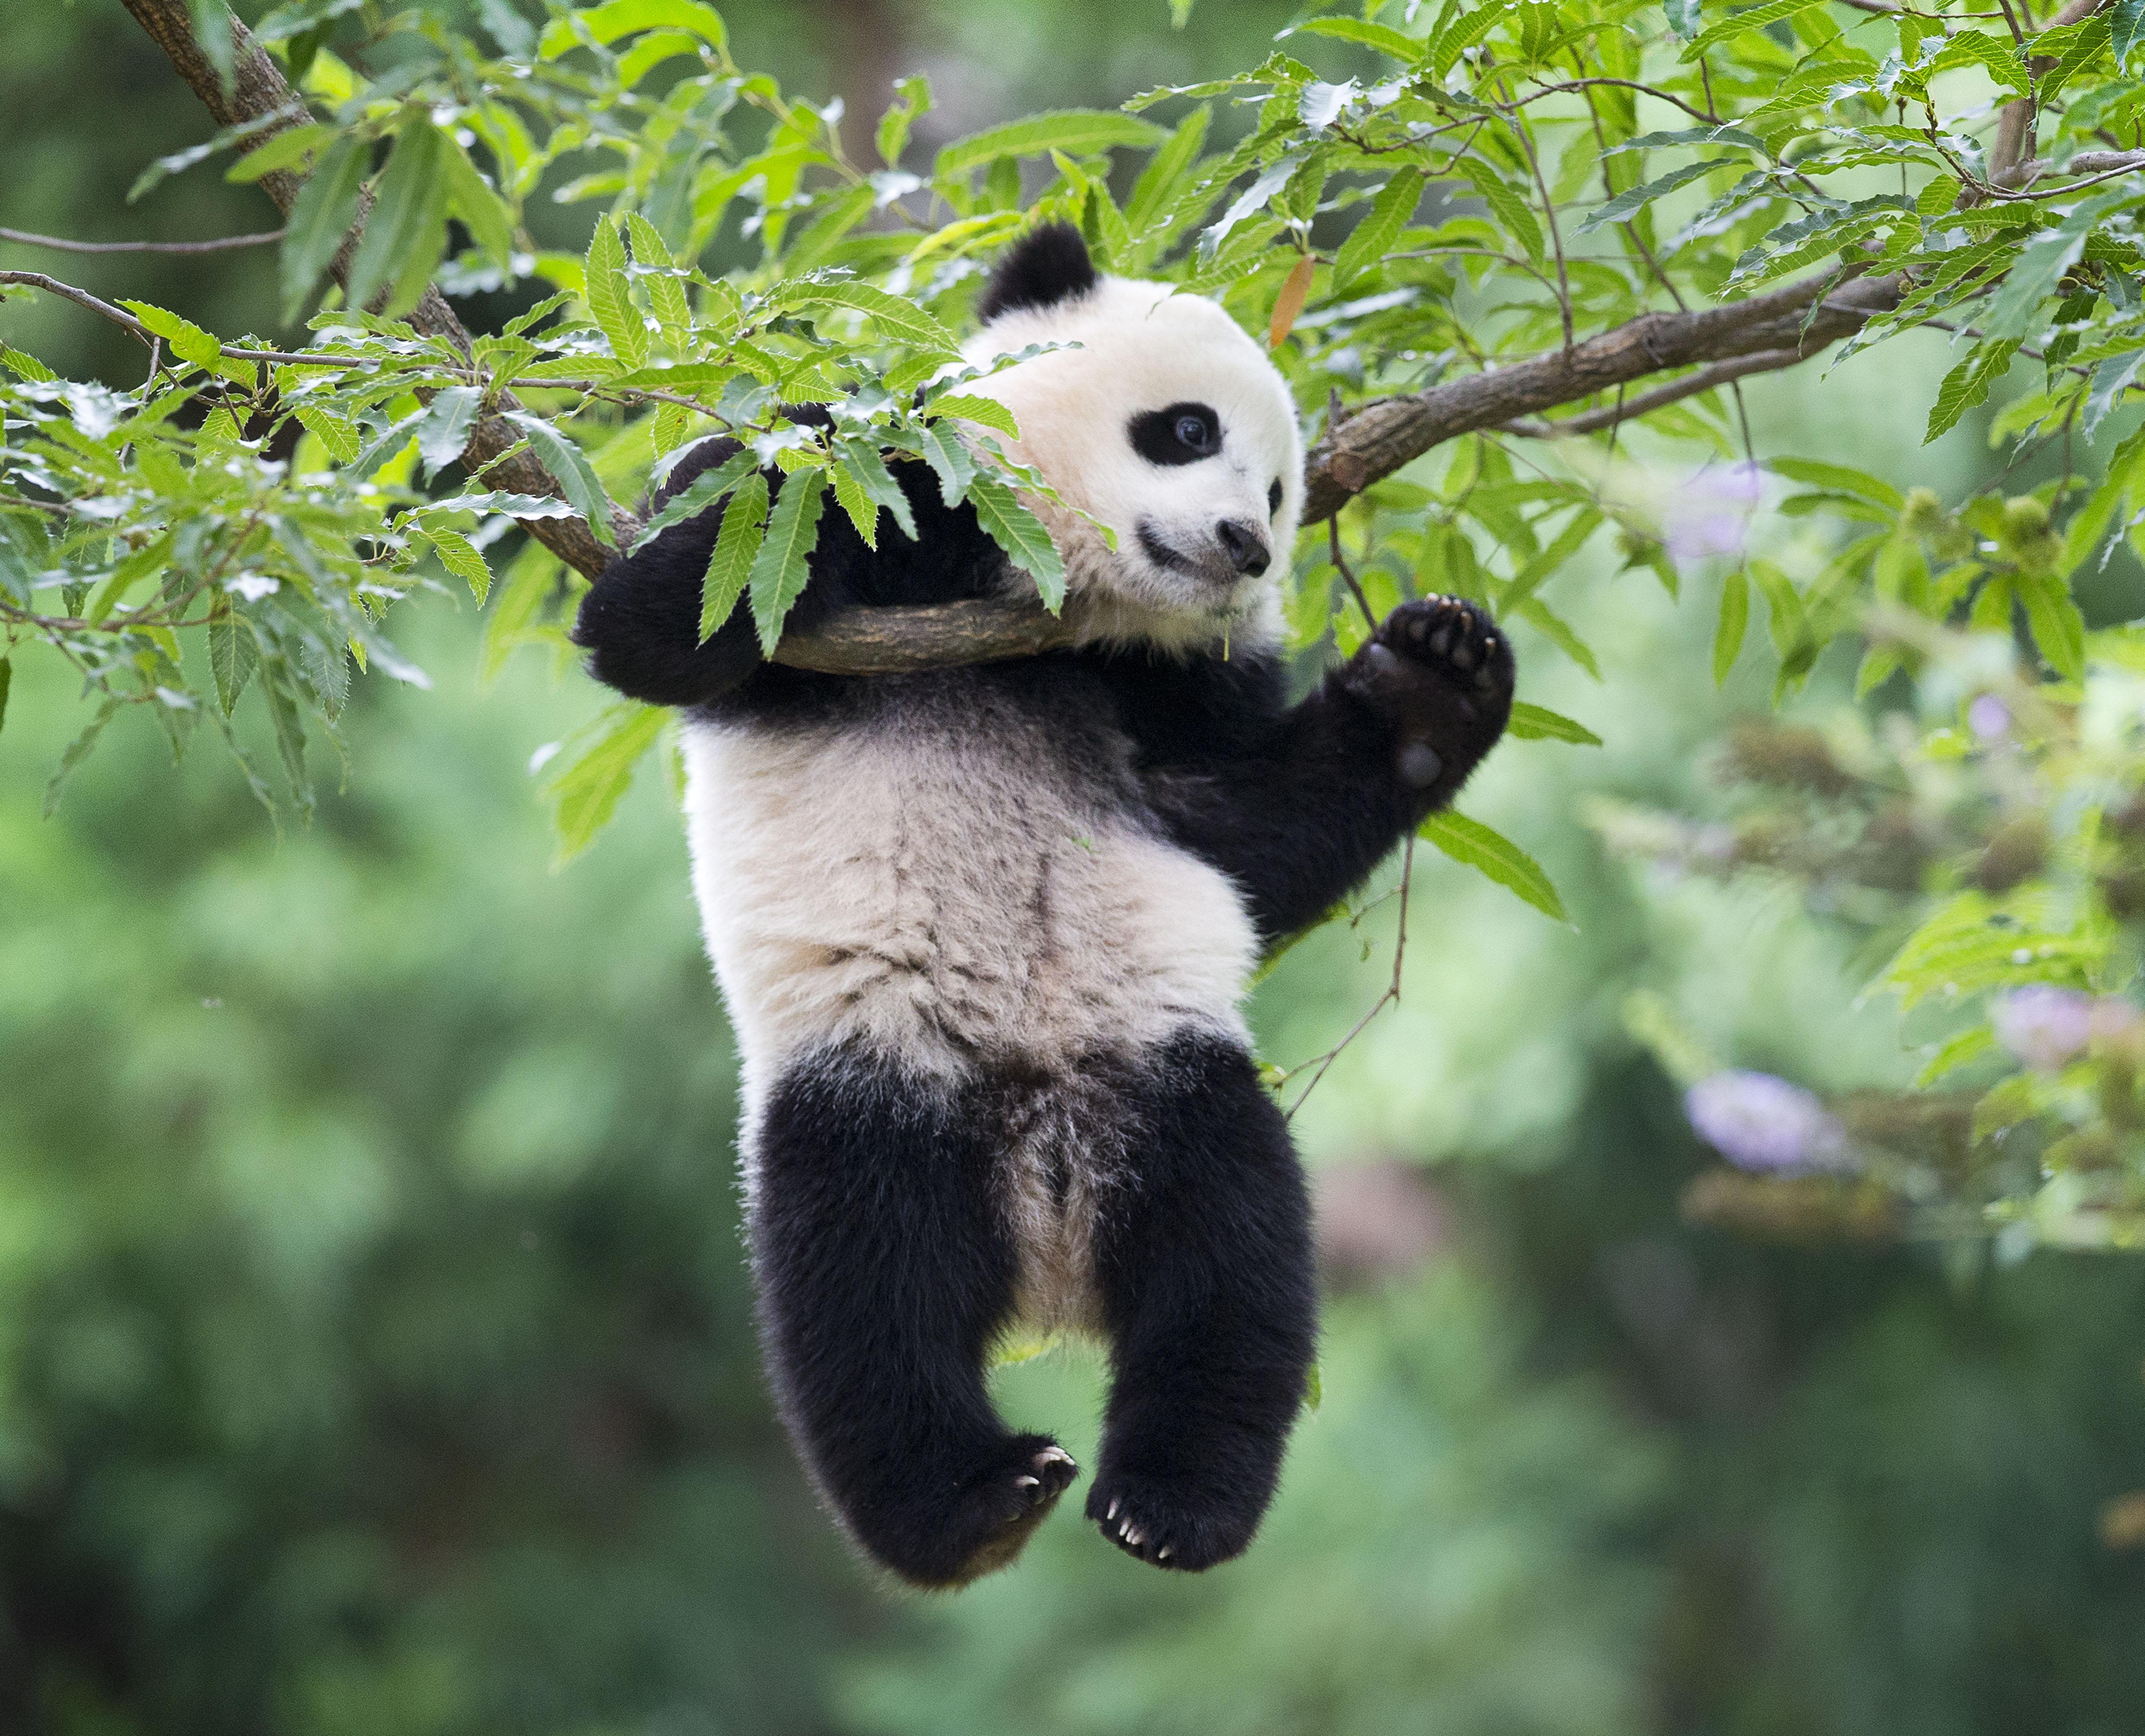 Adorable Bao Bao tumbles around yard at National Zoo (Video)